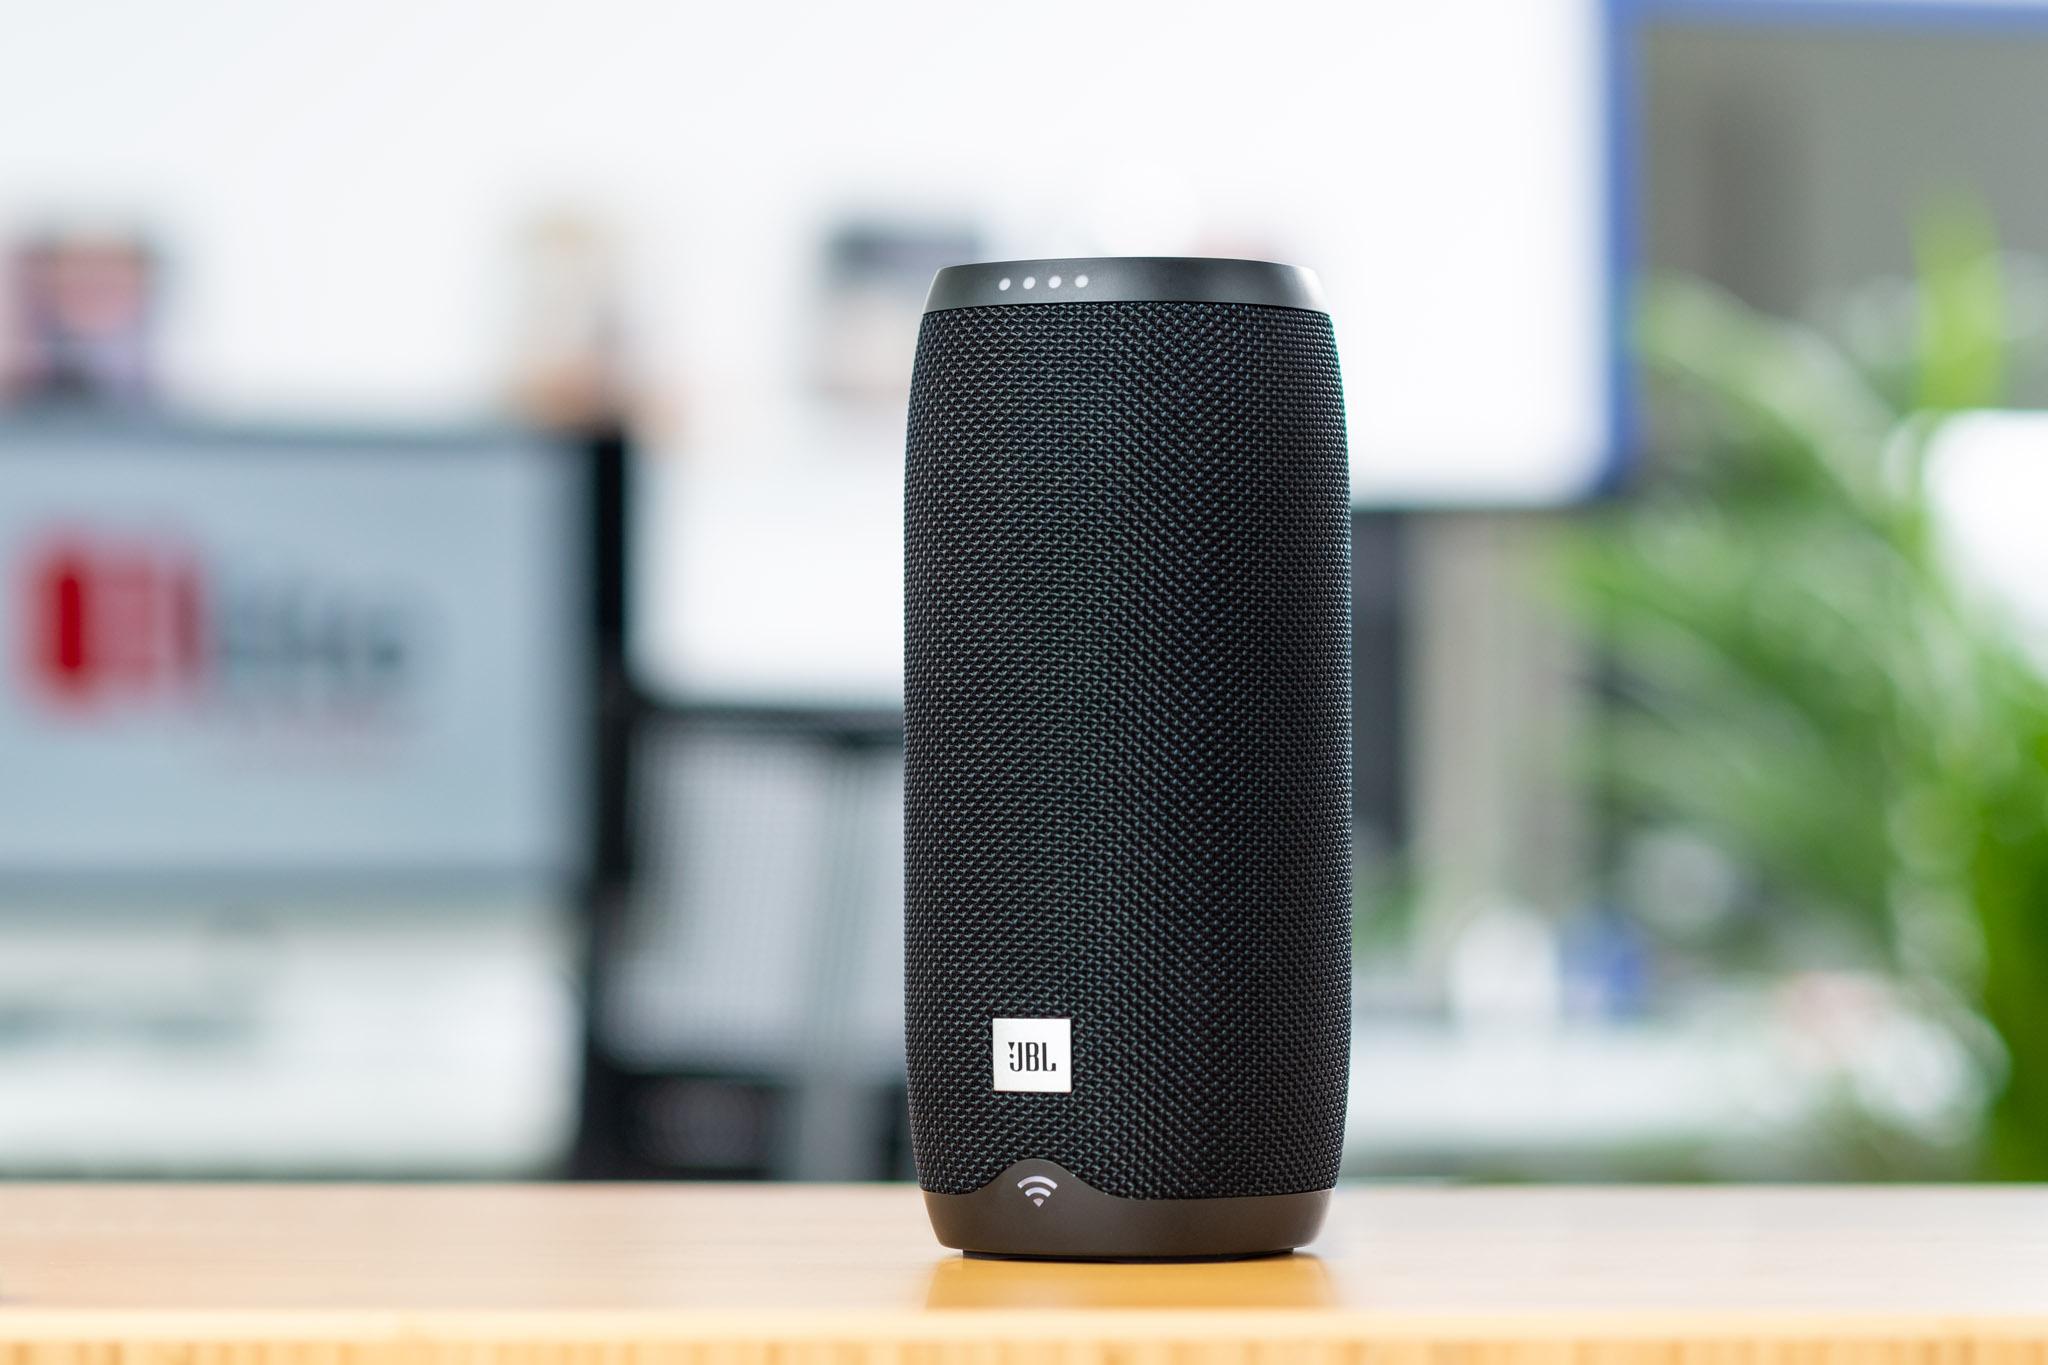 Sprachgesteuerter Bluetooth-/WLAN-Lautsprecher im eleganten Design